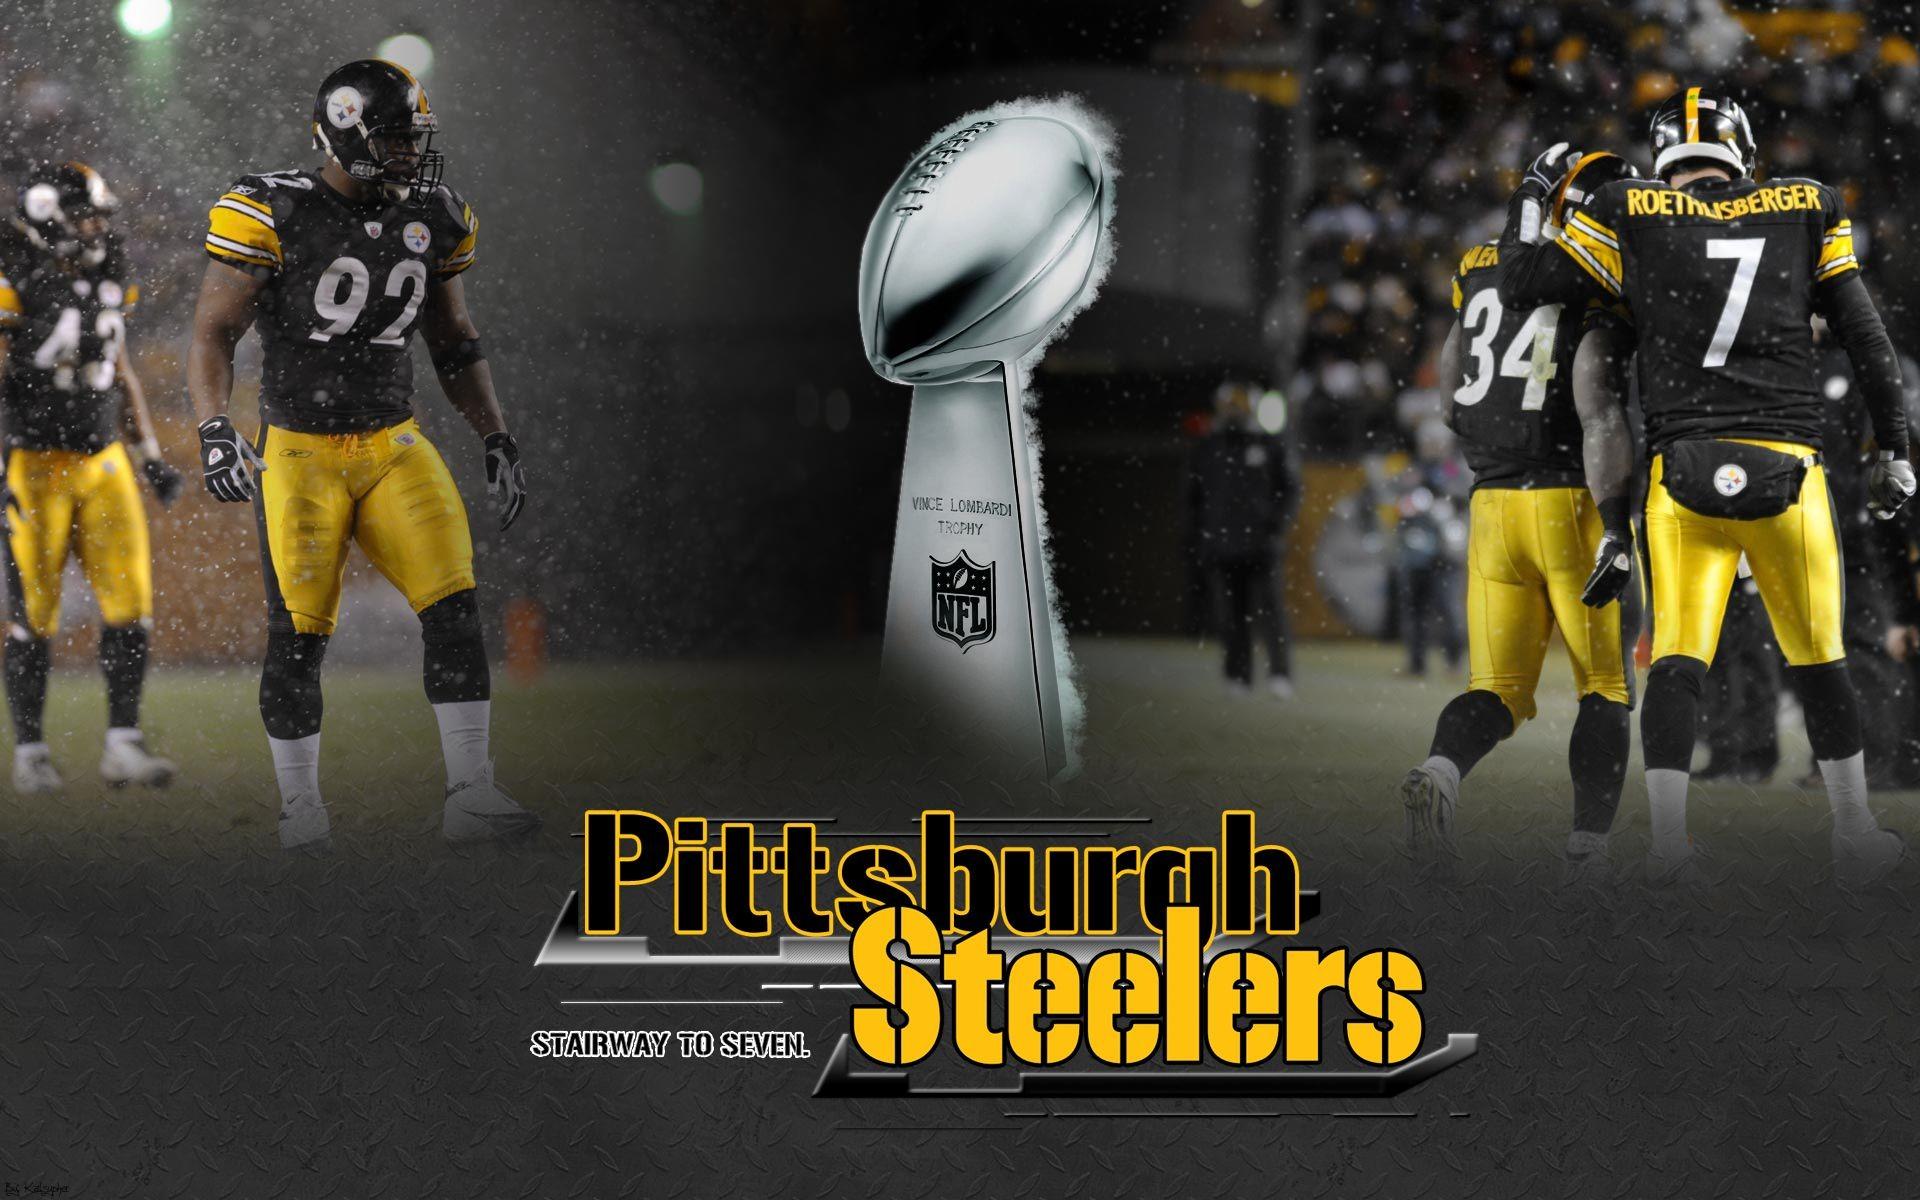 Pittsburgh Steelers Wallpapers for Computer Desktop